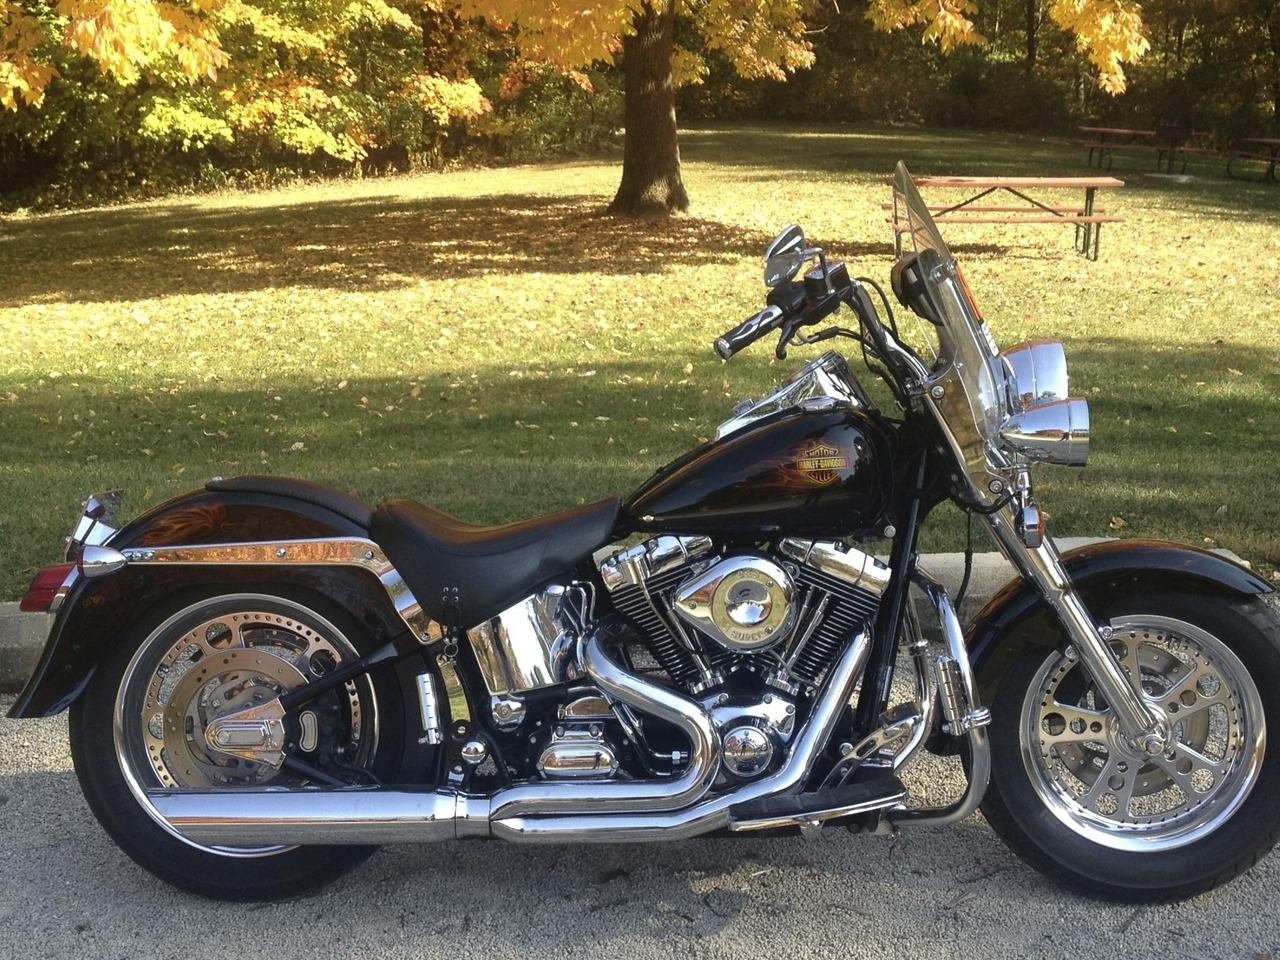 2003 Harley-Davidson Fat Boy , Cycle Trader Used motorcycles price